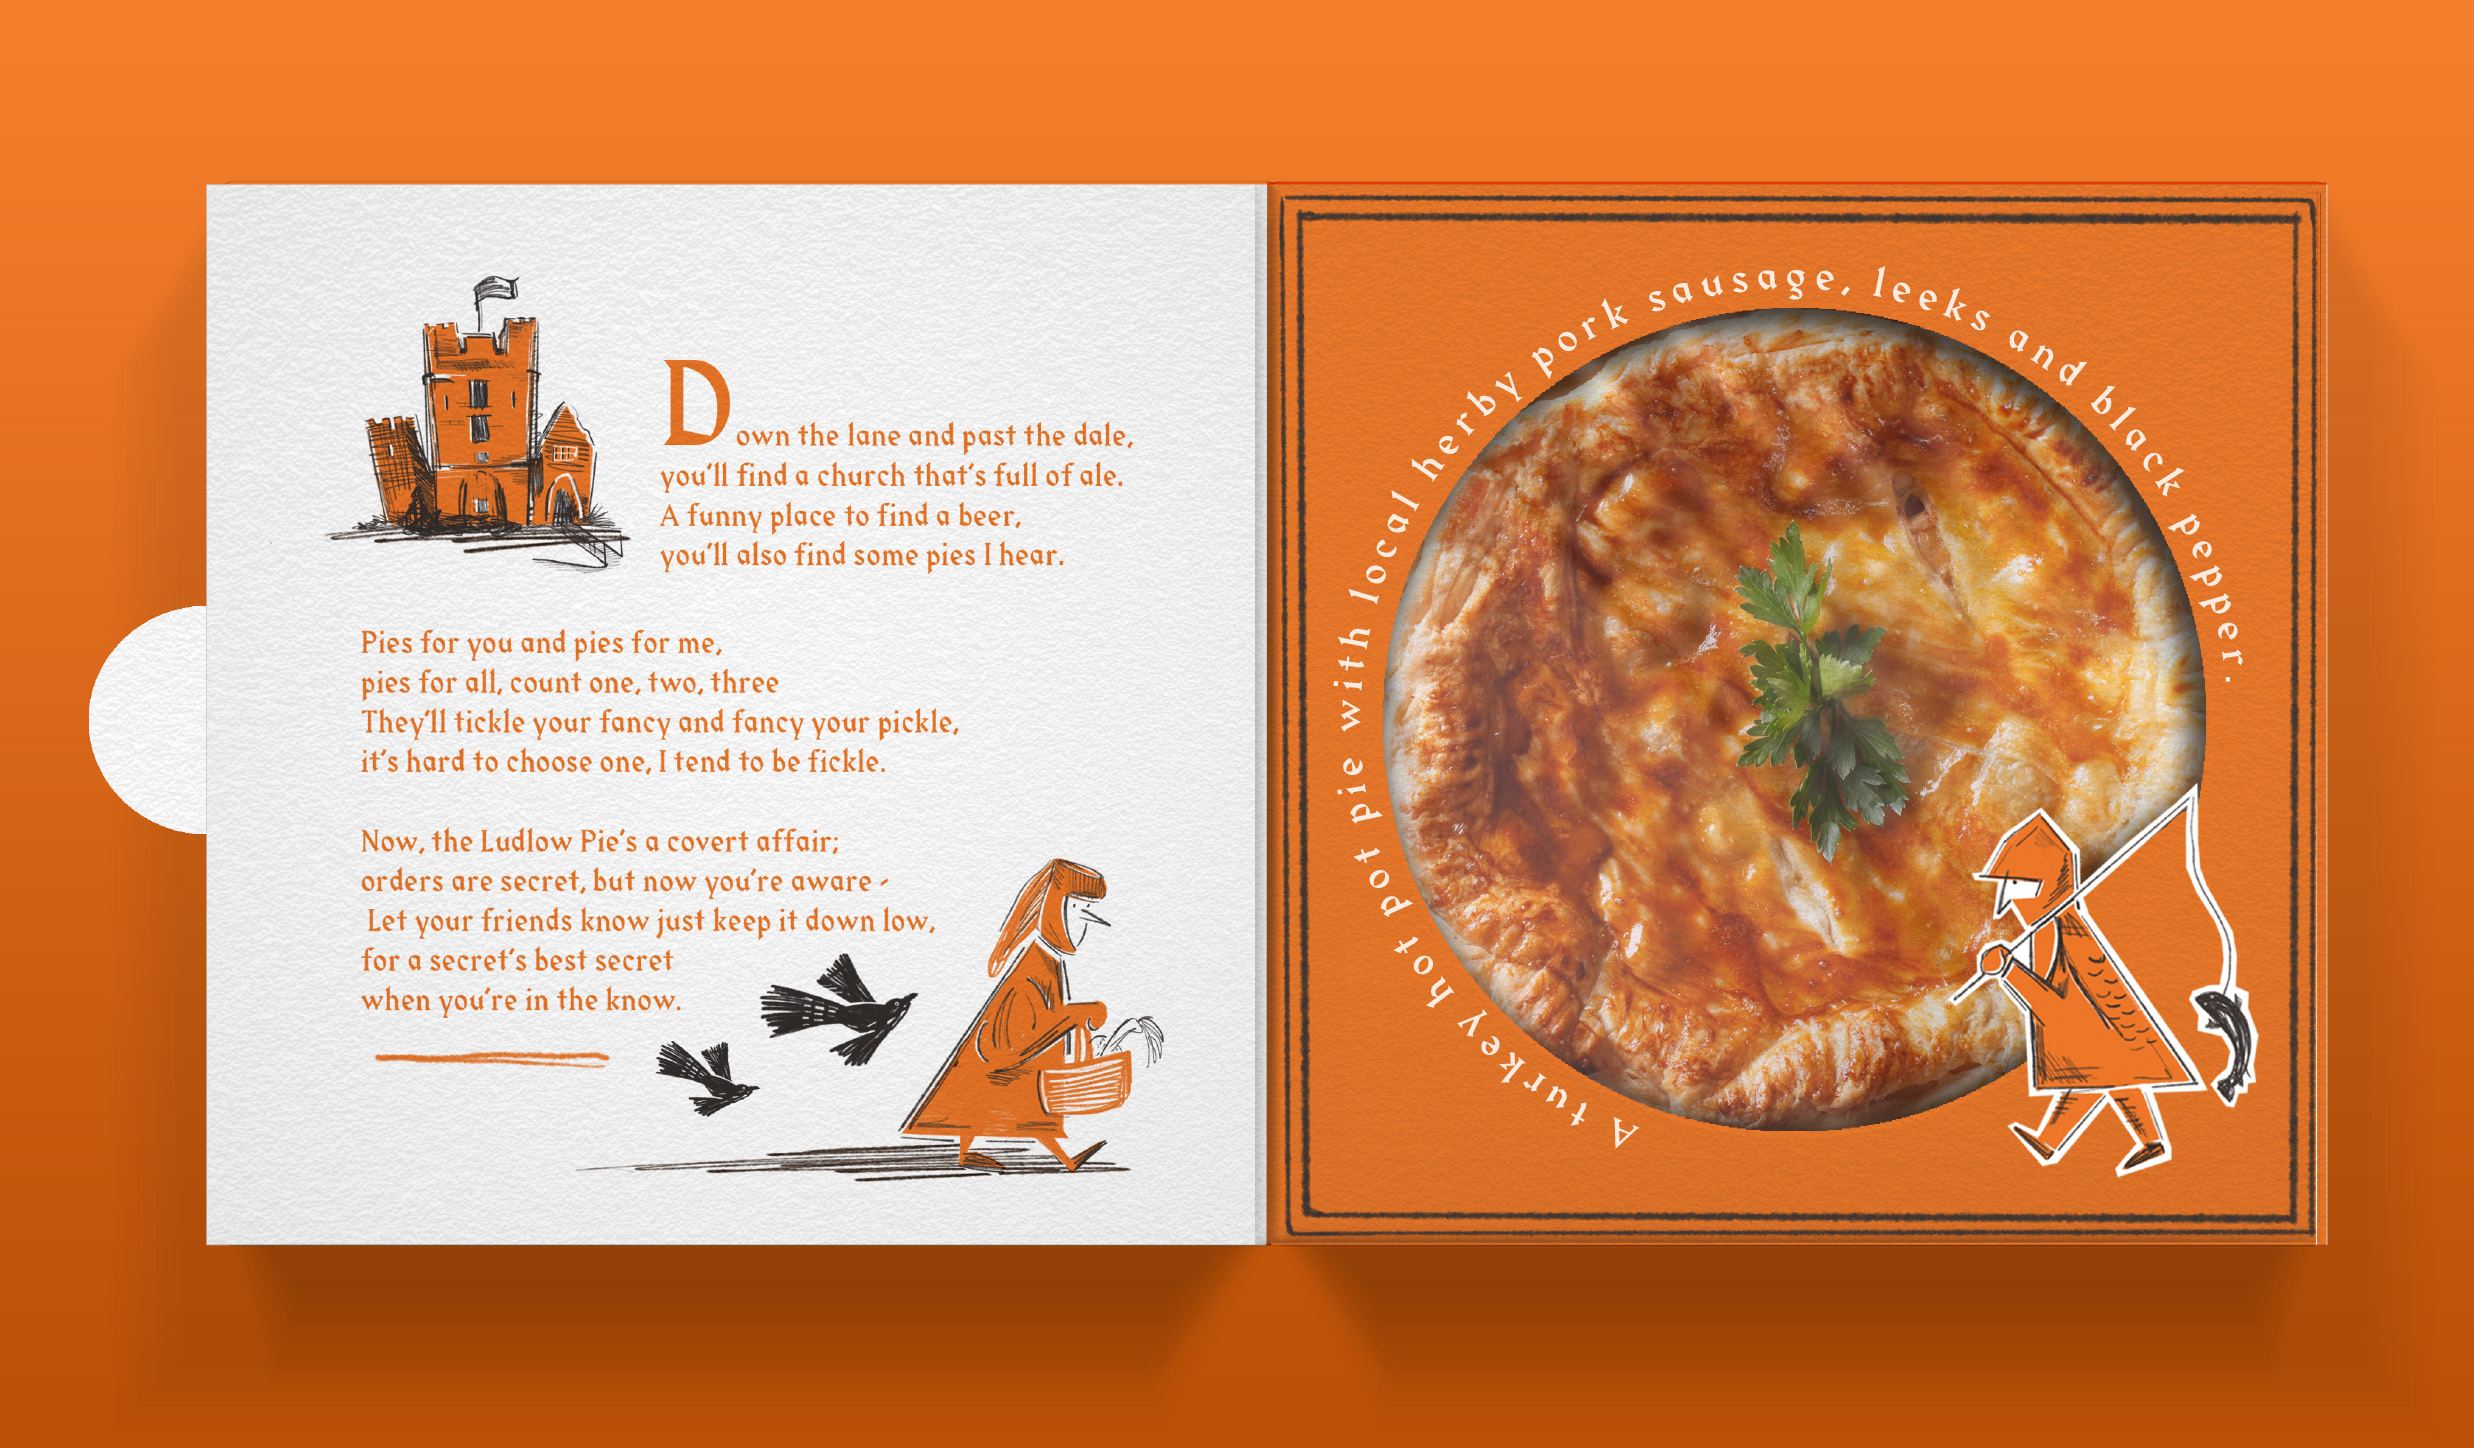 Our Revolution Brand Design Logo Design Packaging Design Brand Strategy Brand Innovation Pie Packaging Food Design Food Brand Food Branding Food Packaging Food innovation Packaging Innovation